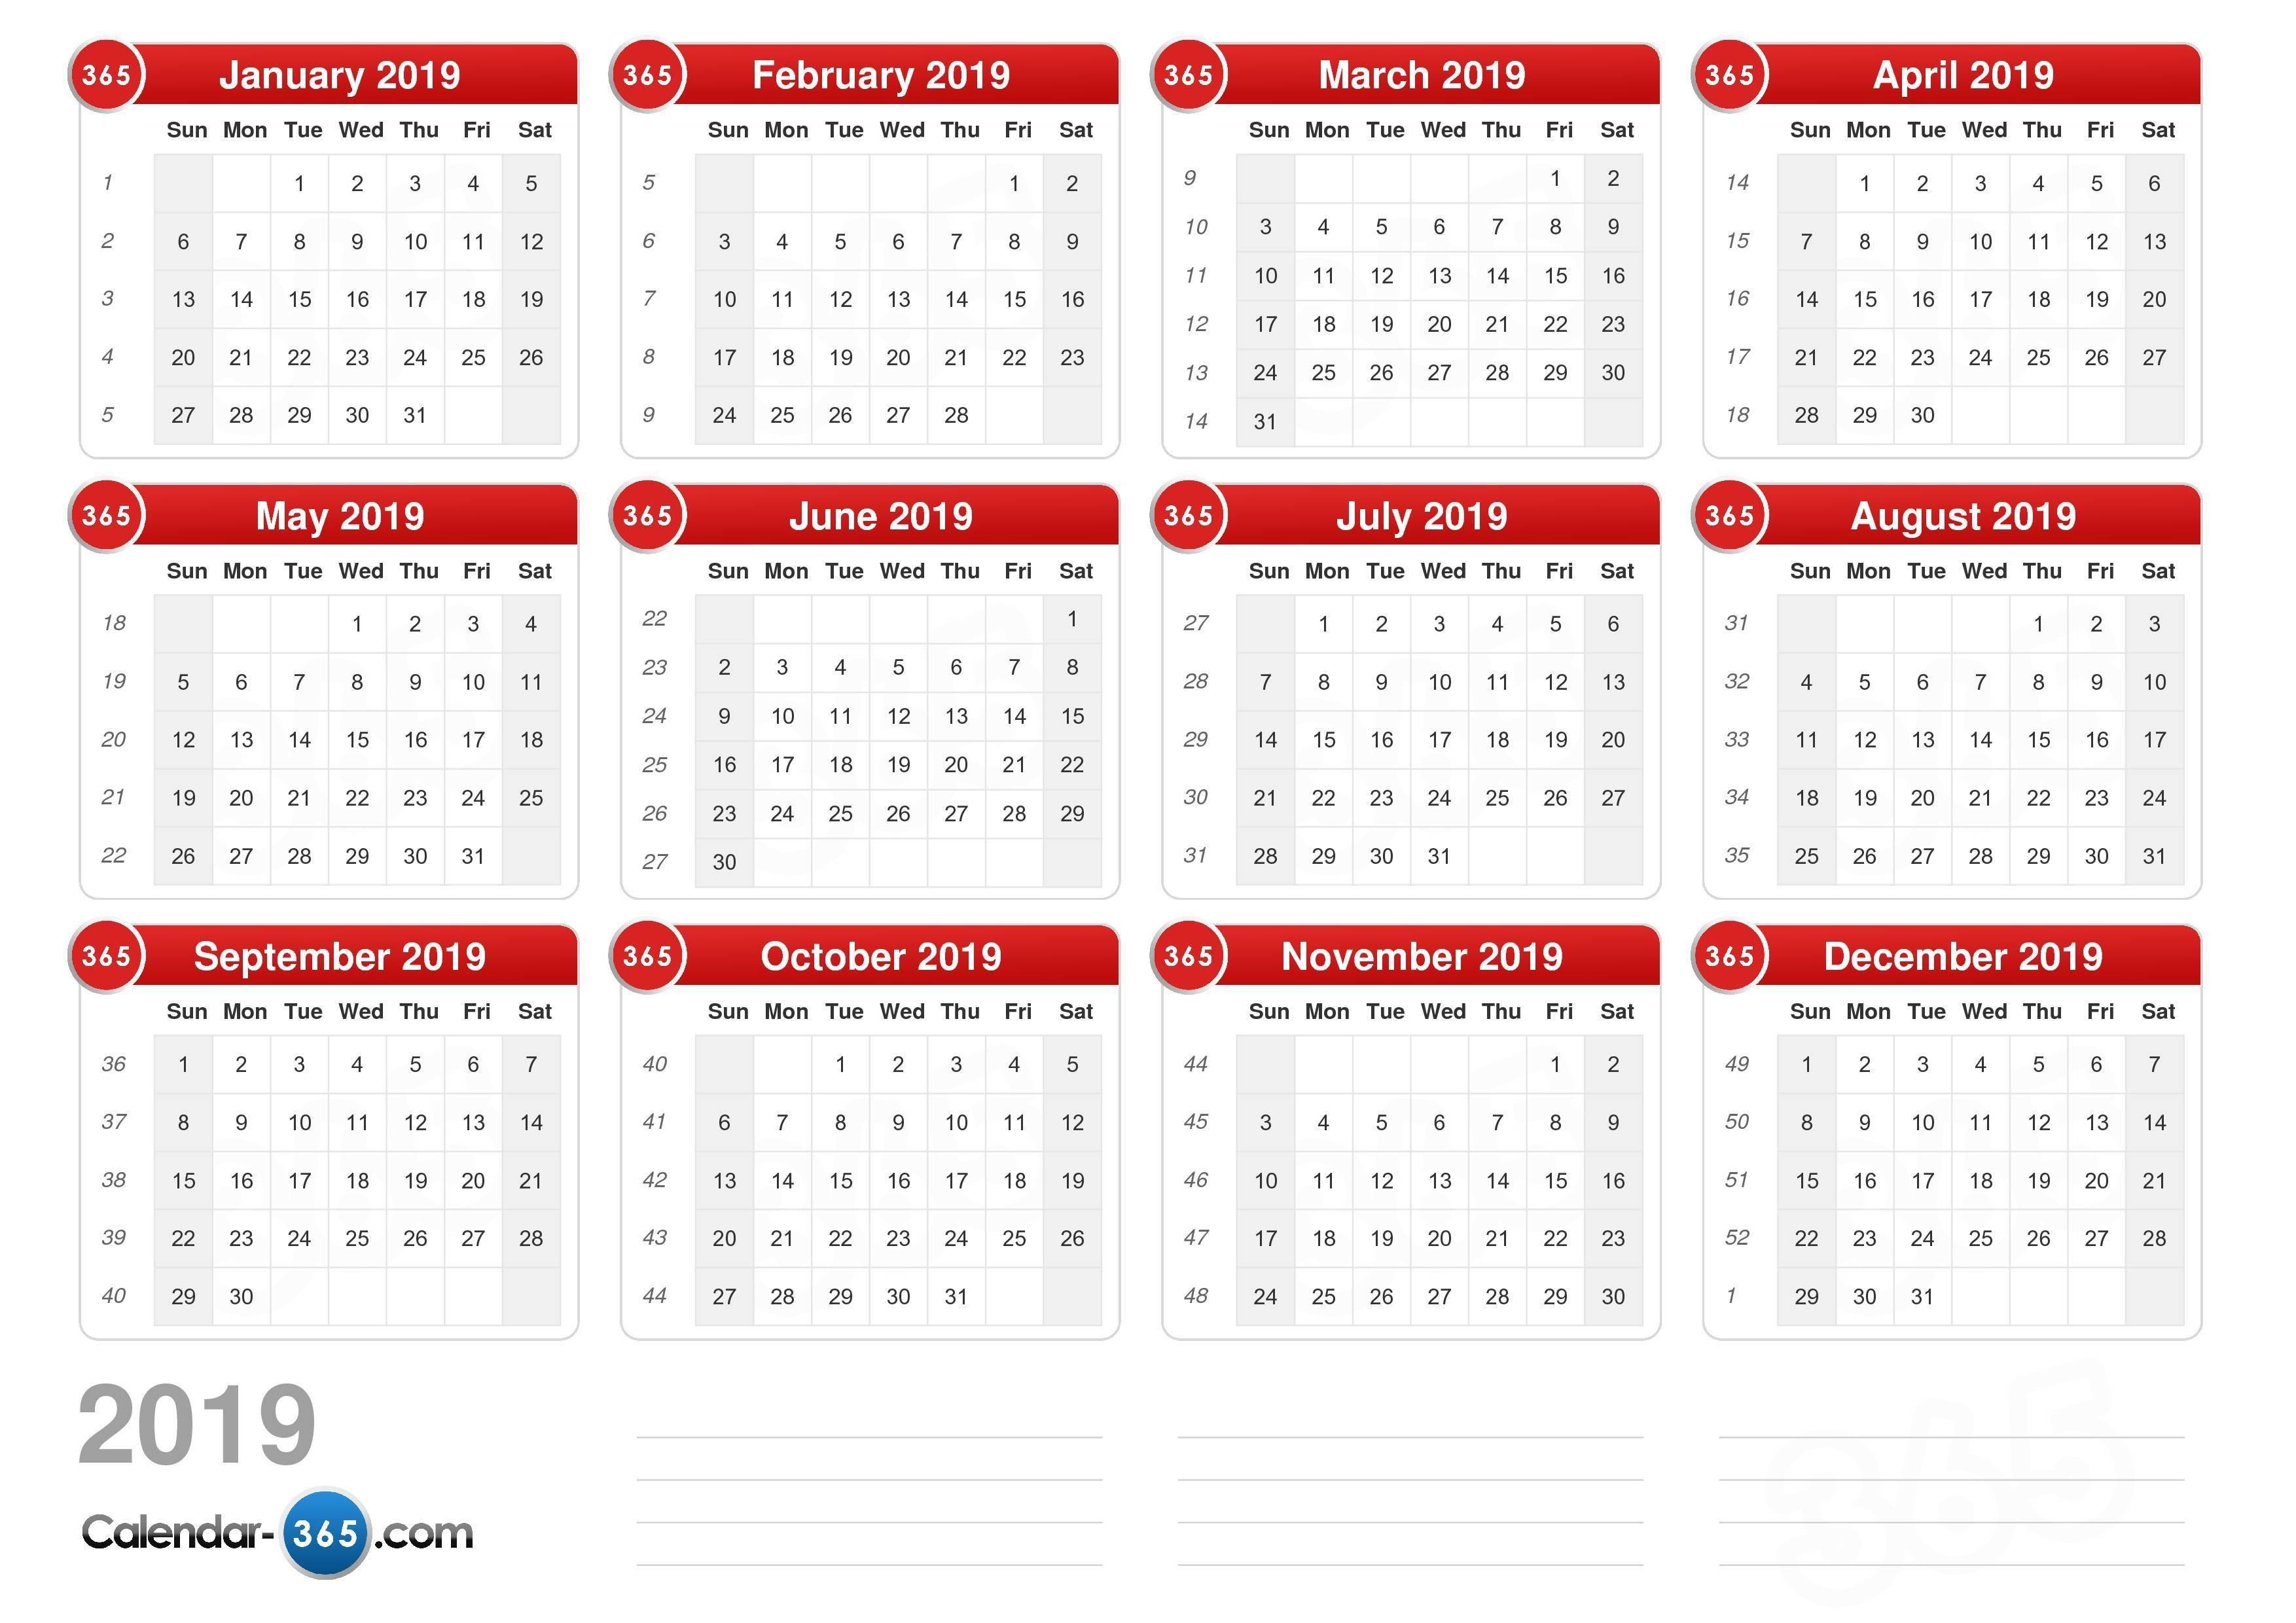 2019 Calendar January 2019 Calendar 365